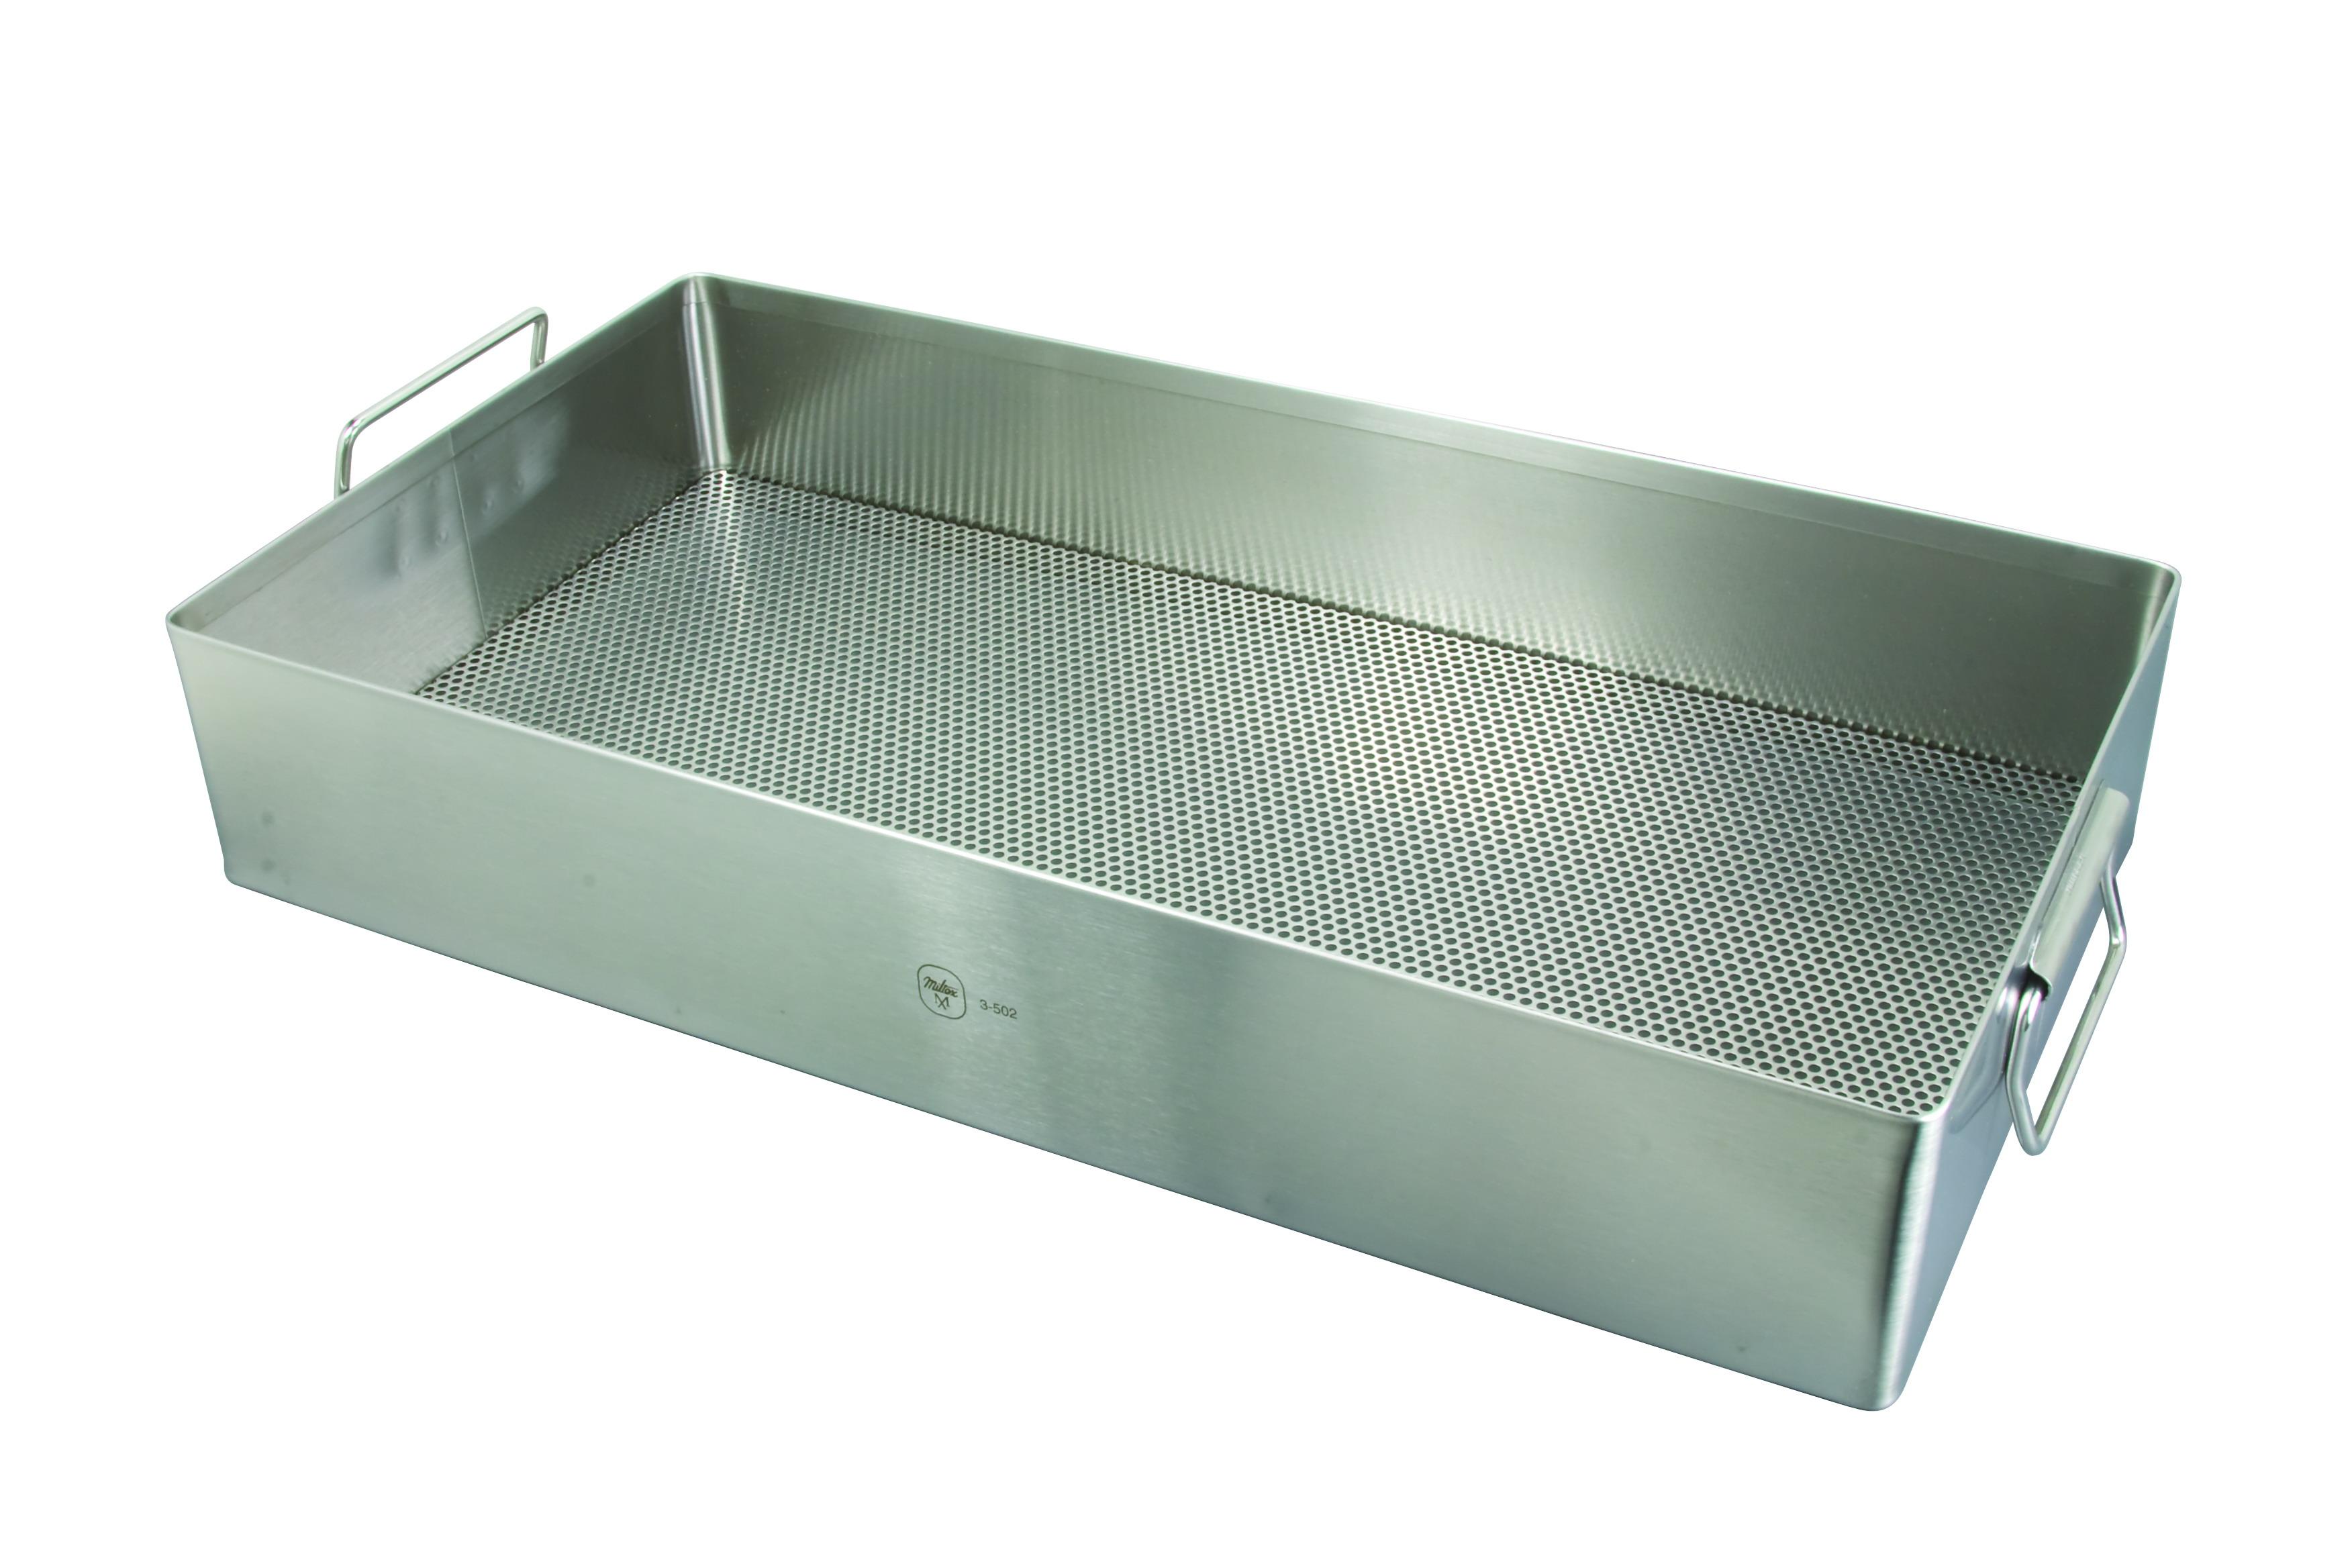 instrument-sterilizing-tray-20-x-10-1-2-x-3-1-2-508-x-26-x-89-cm-3-502-miltex.jpg